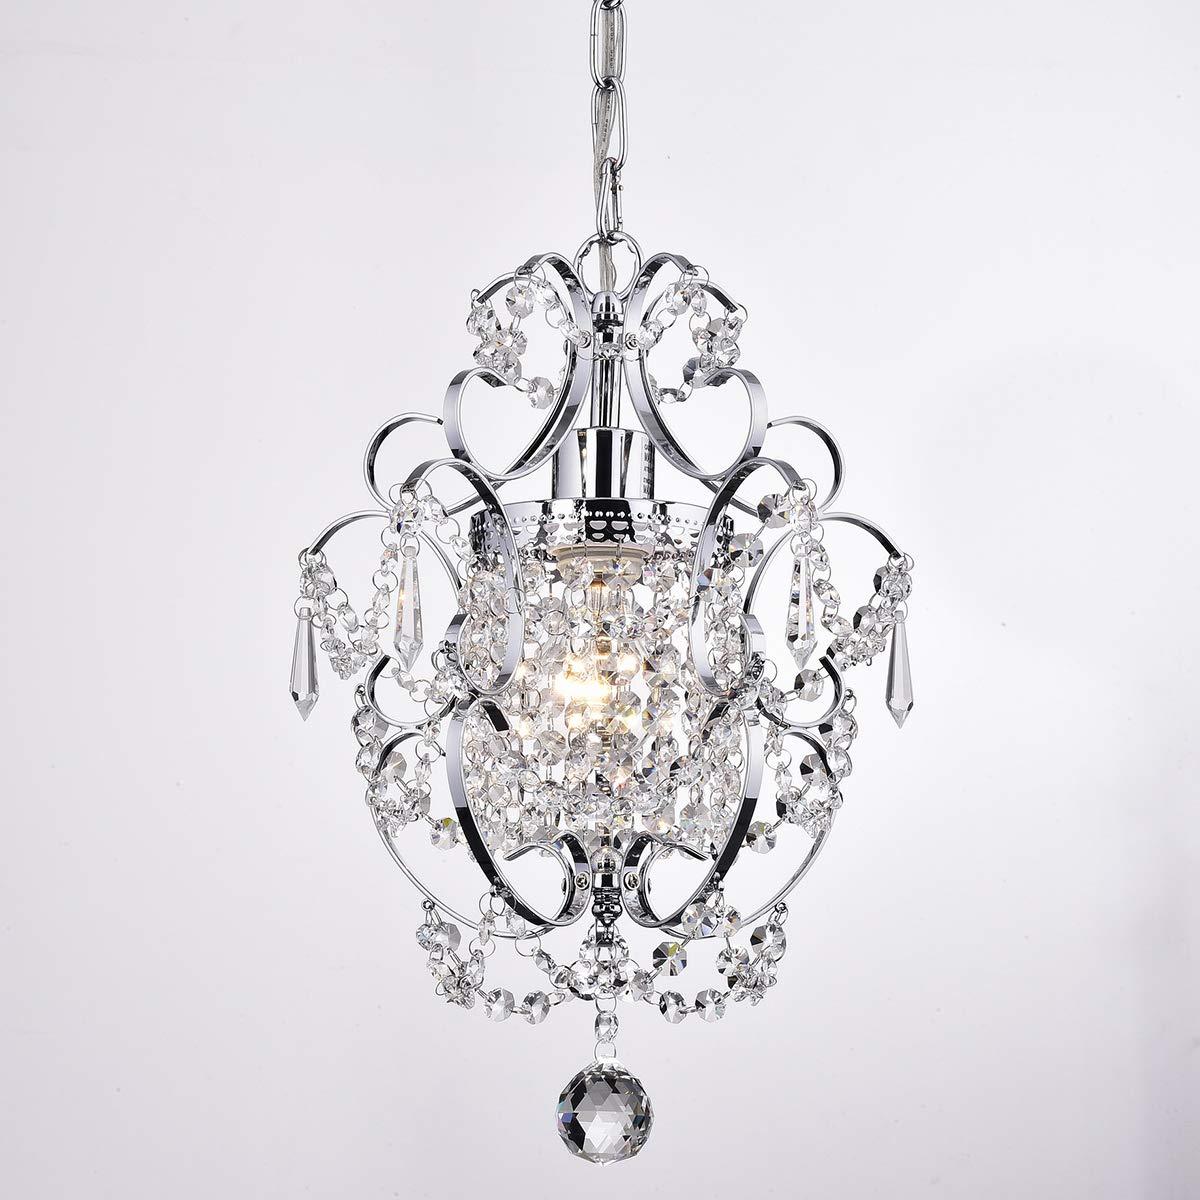 Edvivi Amorette 1-Light Chrome Finish Mini Pendant Chandelier Wrought Iron Ceiling Light Fixture | Glam Lighting by Edvivi (Image #4)